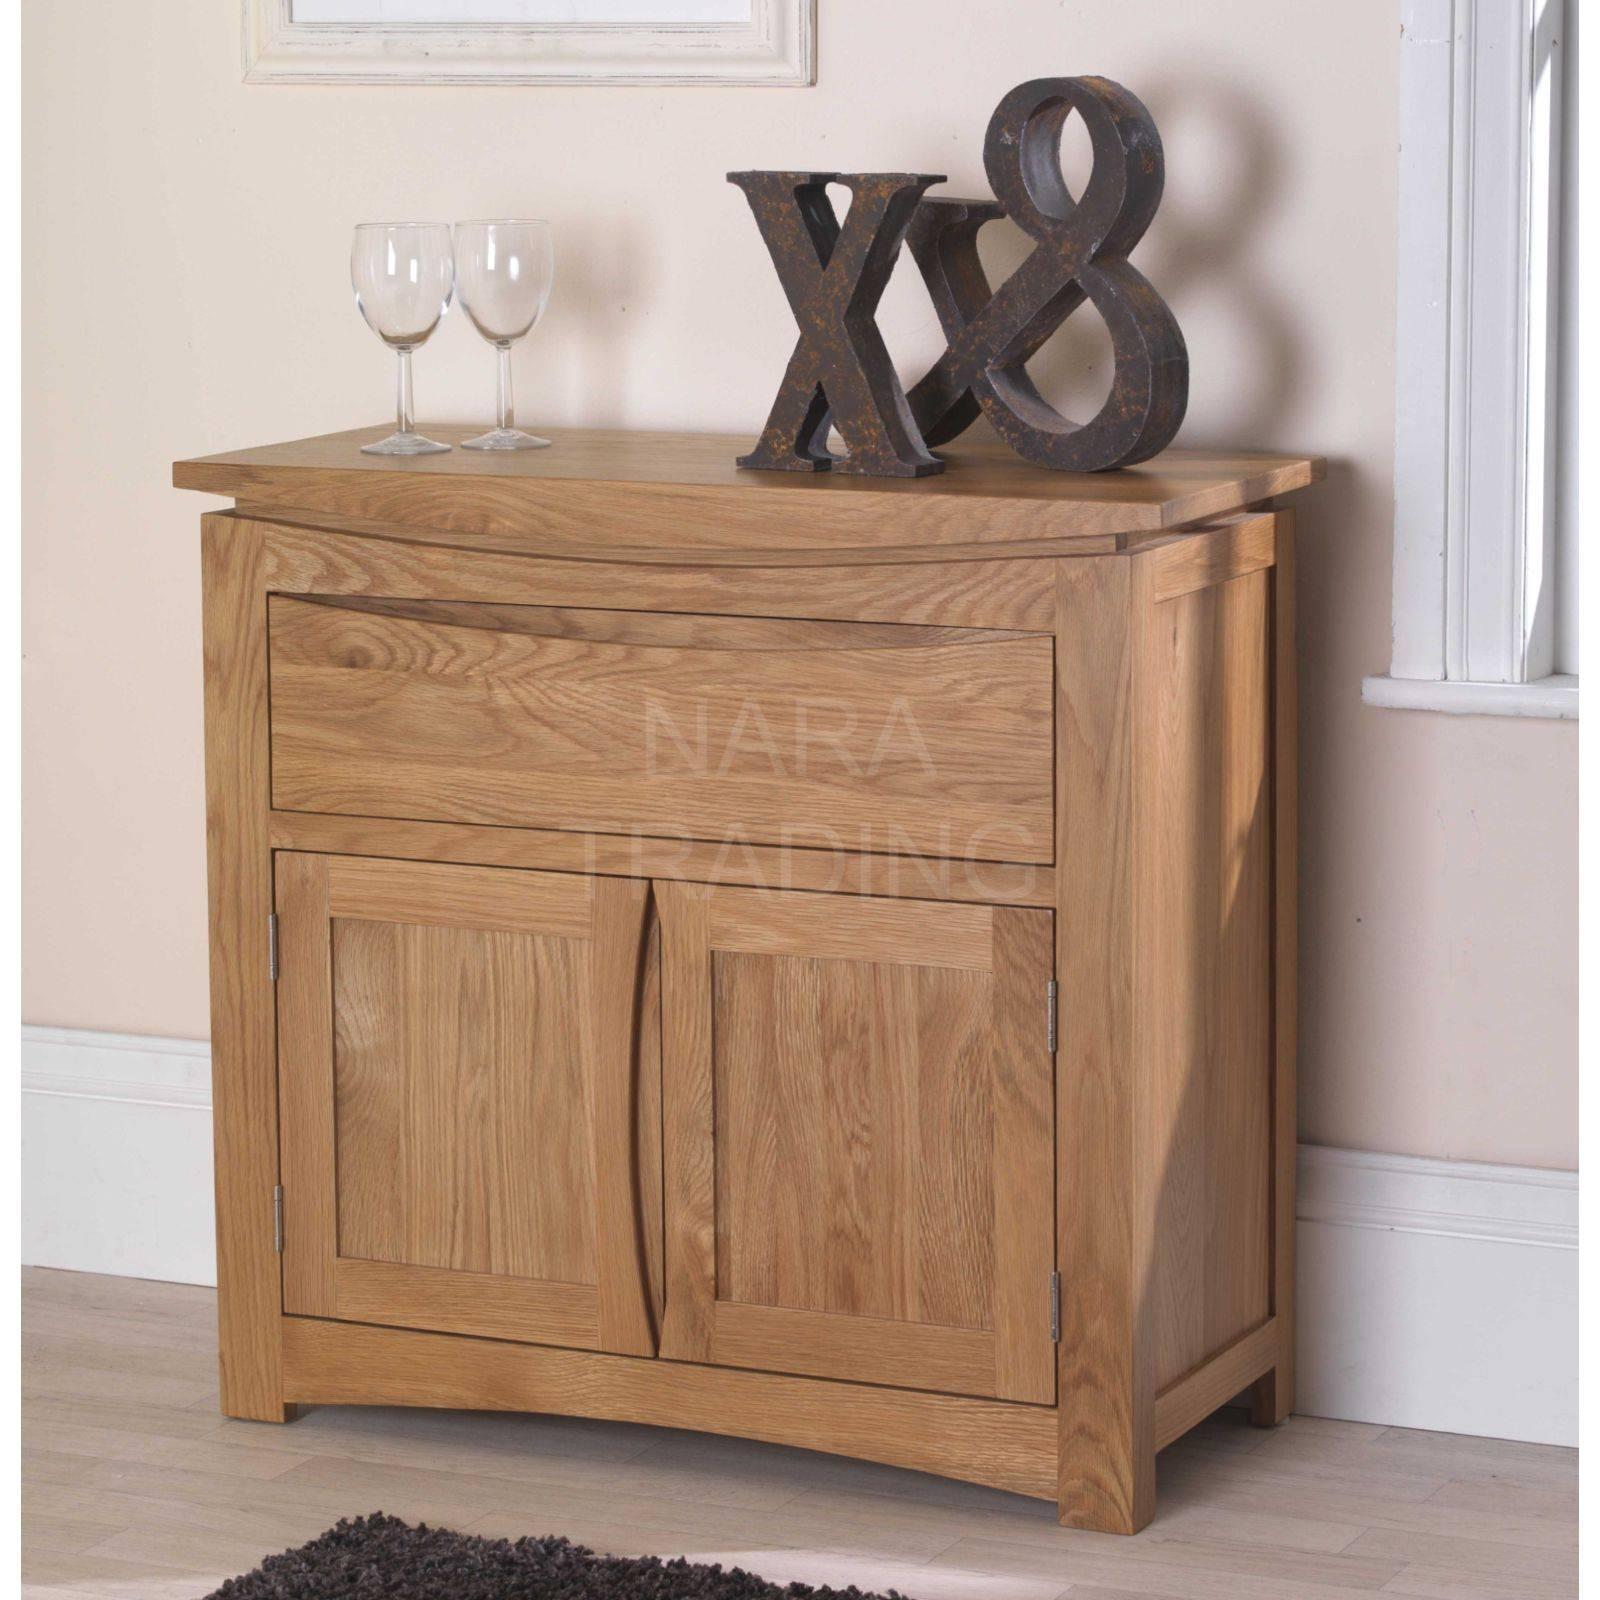 Crescent Solid Oak Furniture Small Sideboard Inside Current Solid Oak Small Sideboards (View 14 of 15)